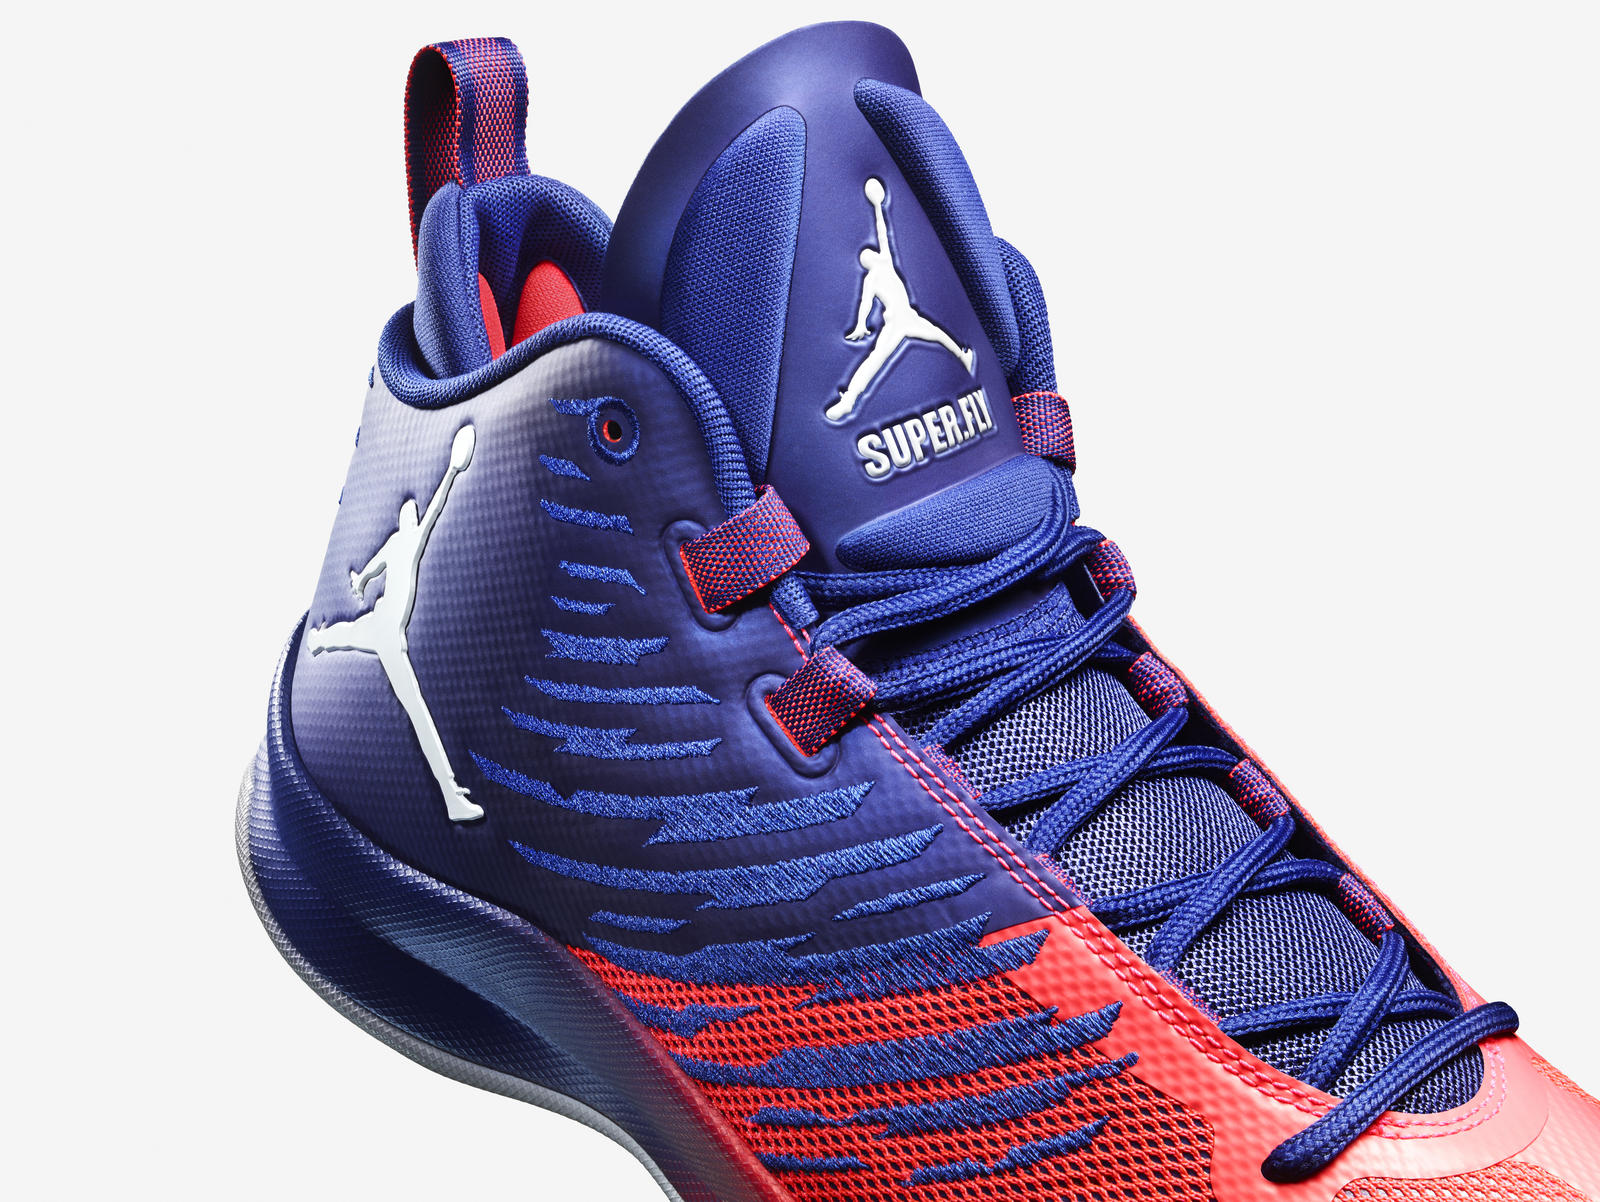 nike air max 93 à vendre - Nike News - Jordan Brand Unveils the Super.Fly 5